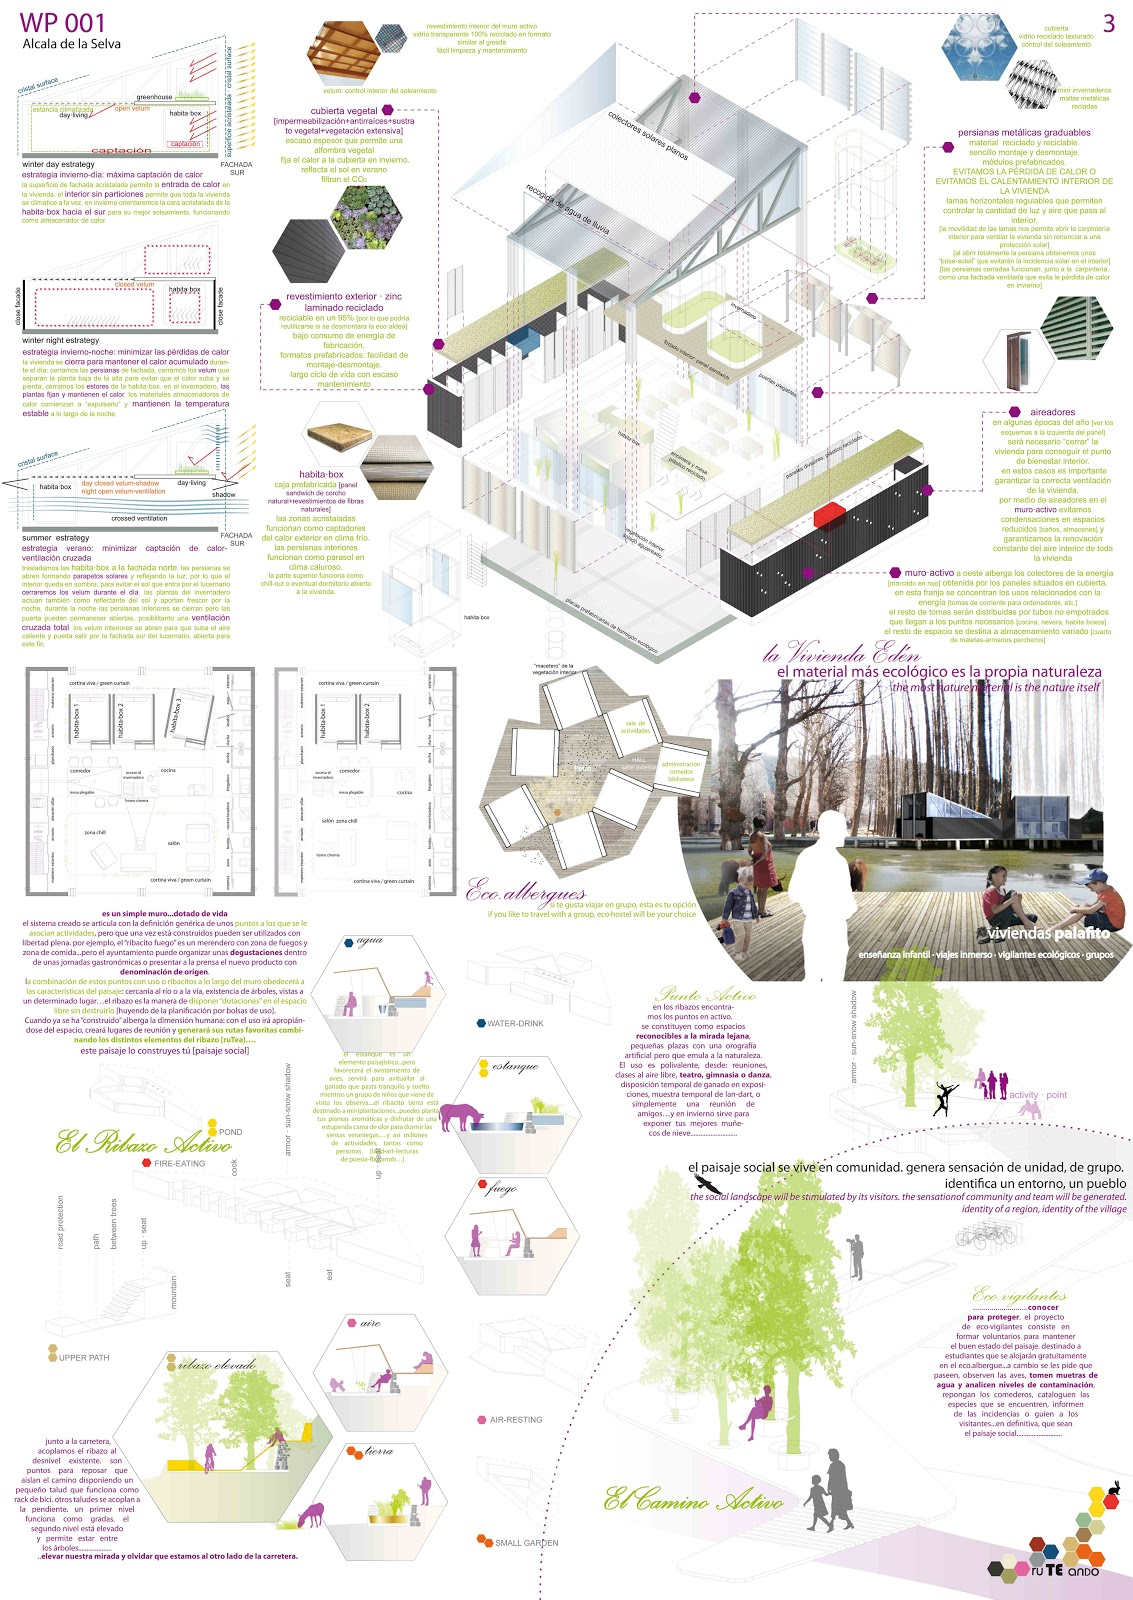 Nairagallardoruiz Arquitectura Planificaci N Cultural